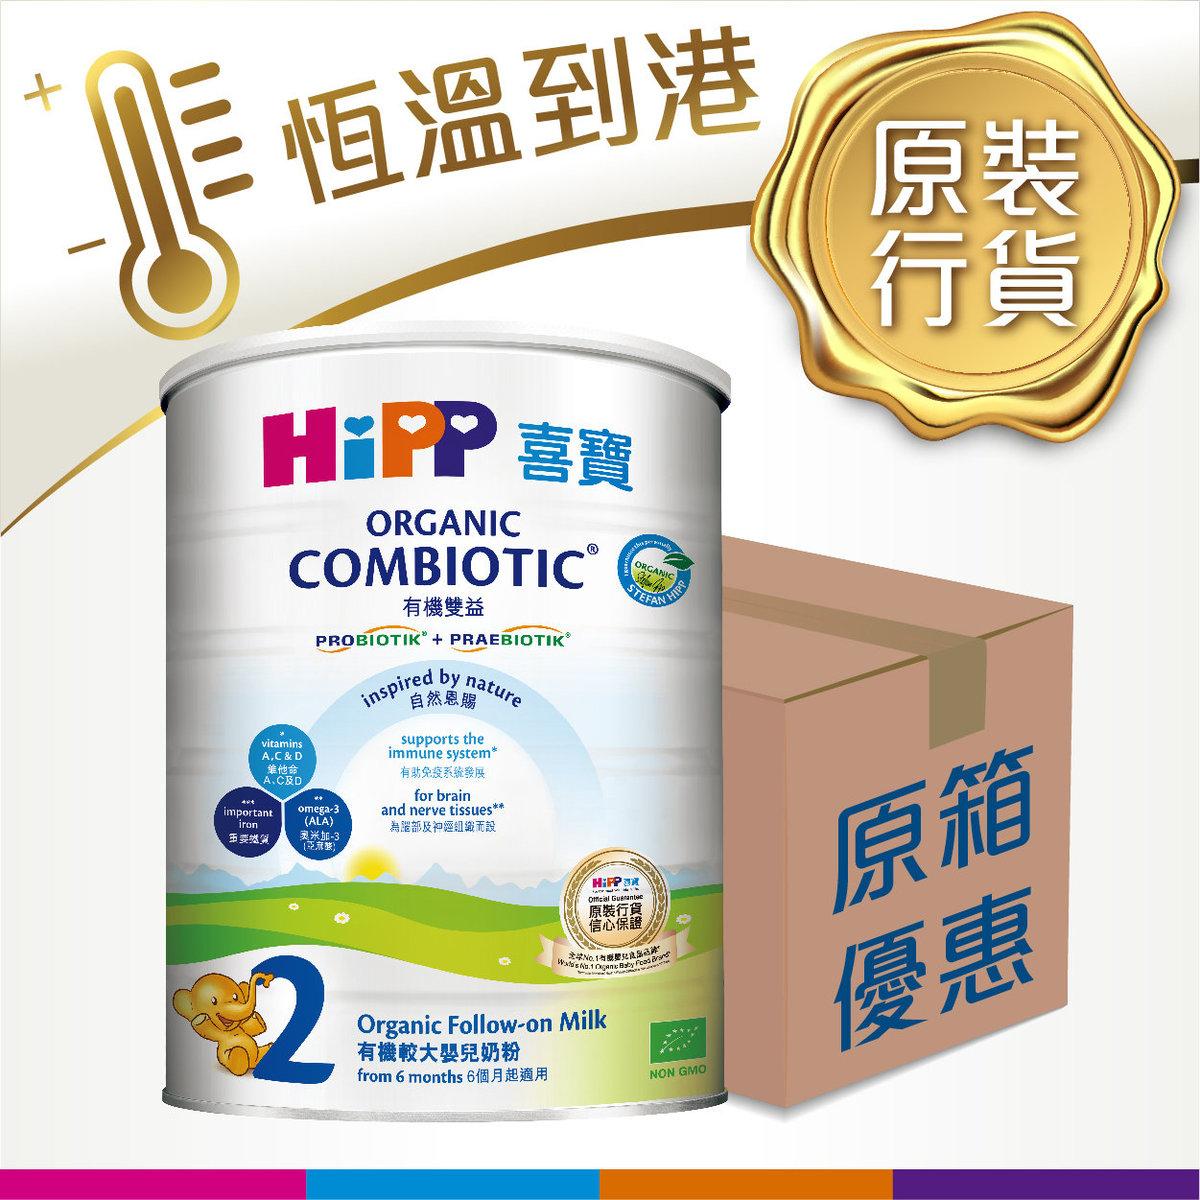 HiPP喜寶奶粉- 2號雙益較大嬰兒奶粉 (800克) 原箱6罐